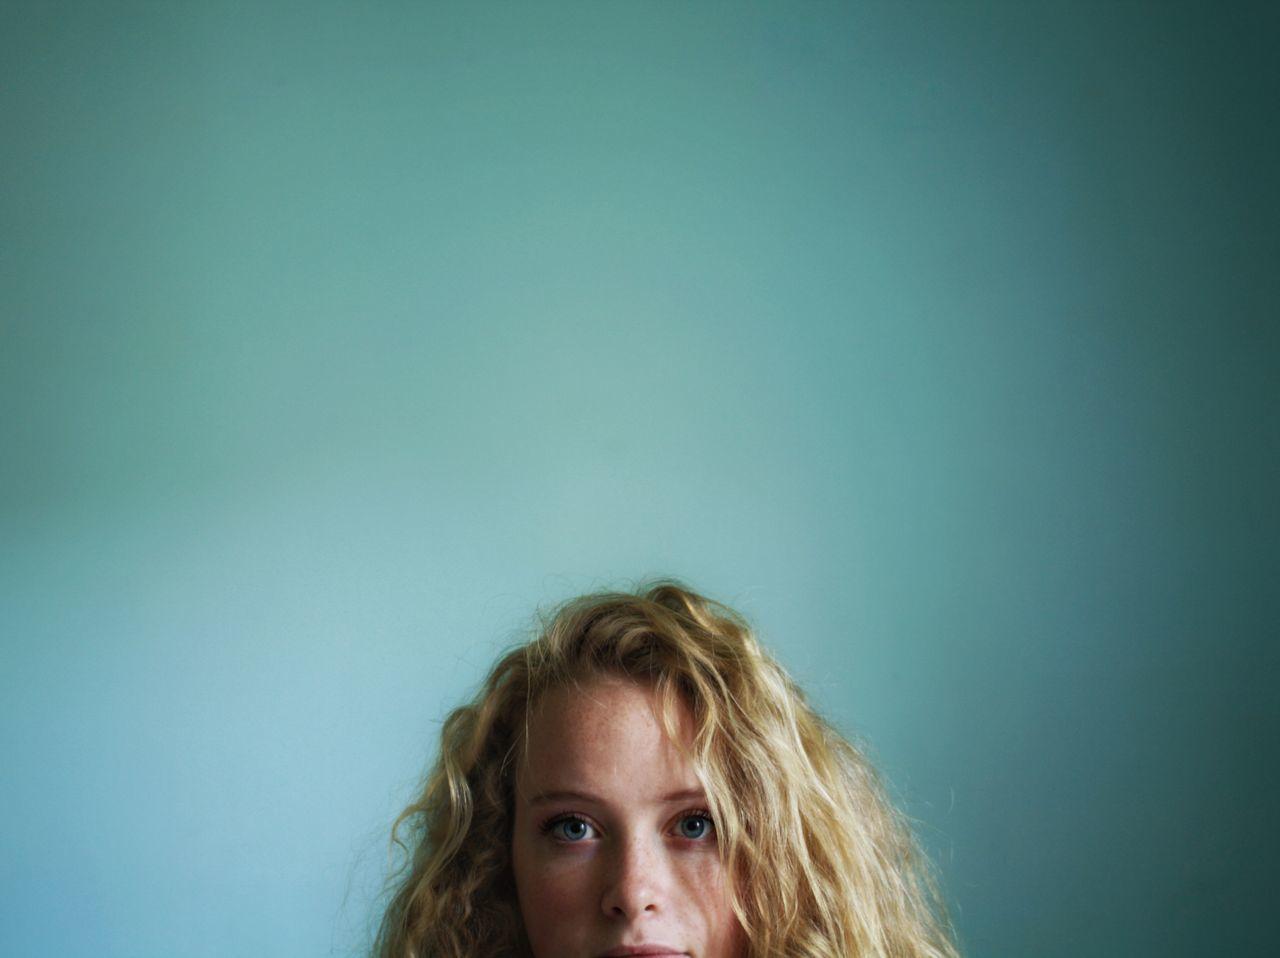 Beautiful stock photos of portrait, 18-19 Years, Beautiful Woman, Blond Hair, Blue